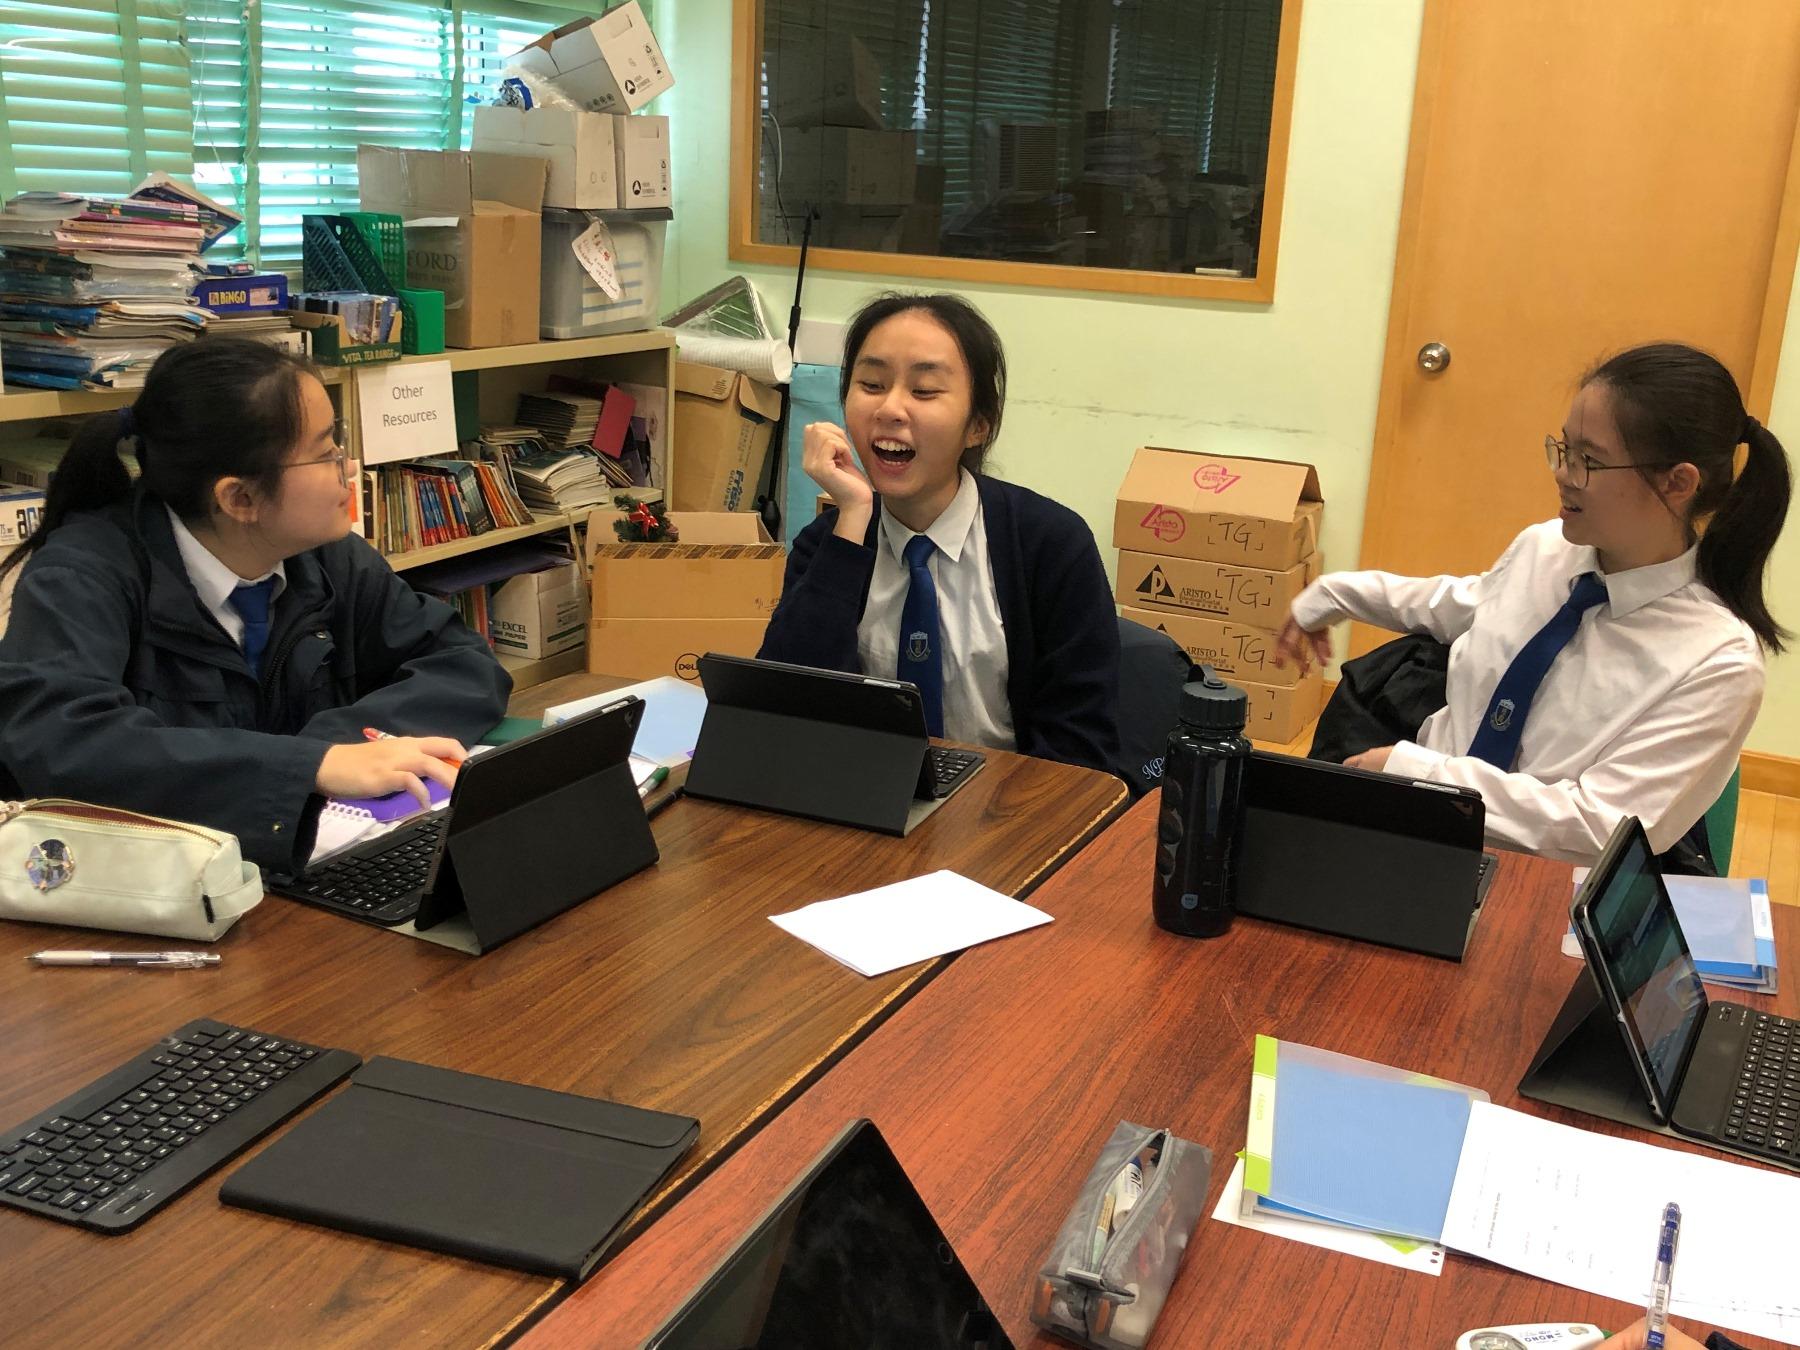 http://npc.edu.hk/sites/default/files/img_3035.jpg